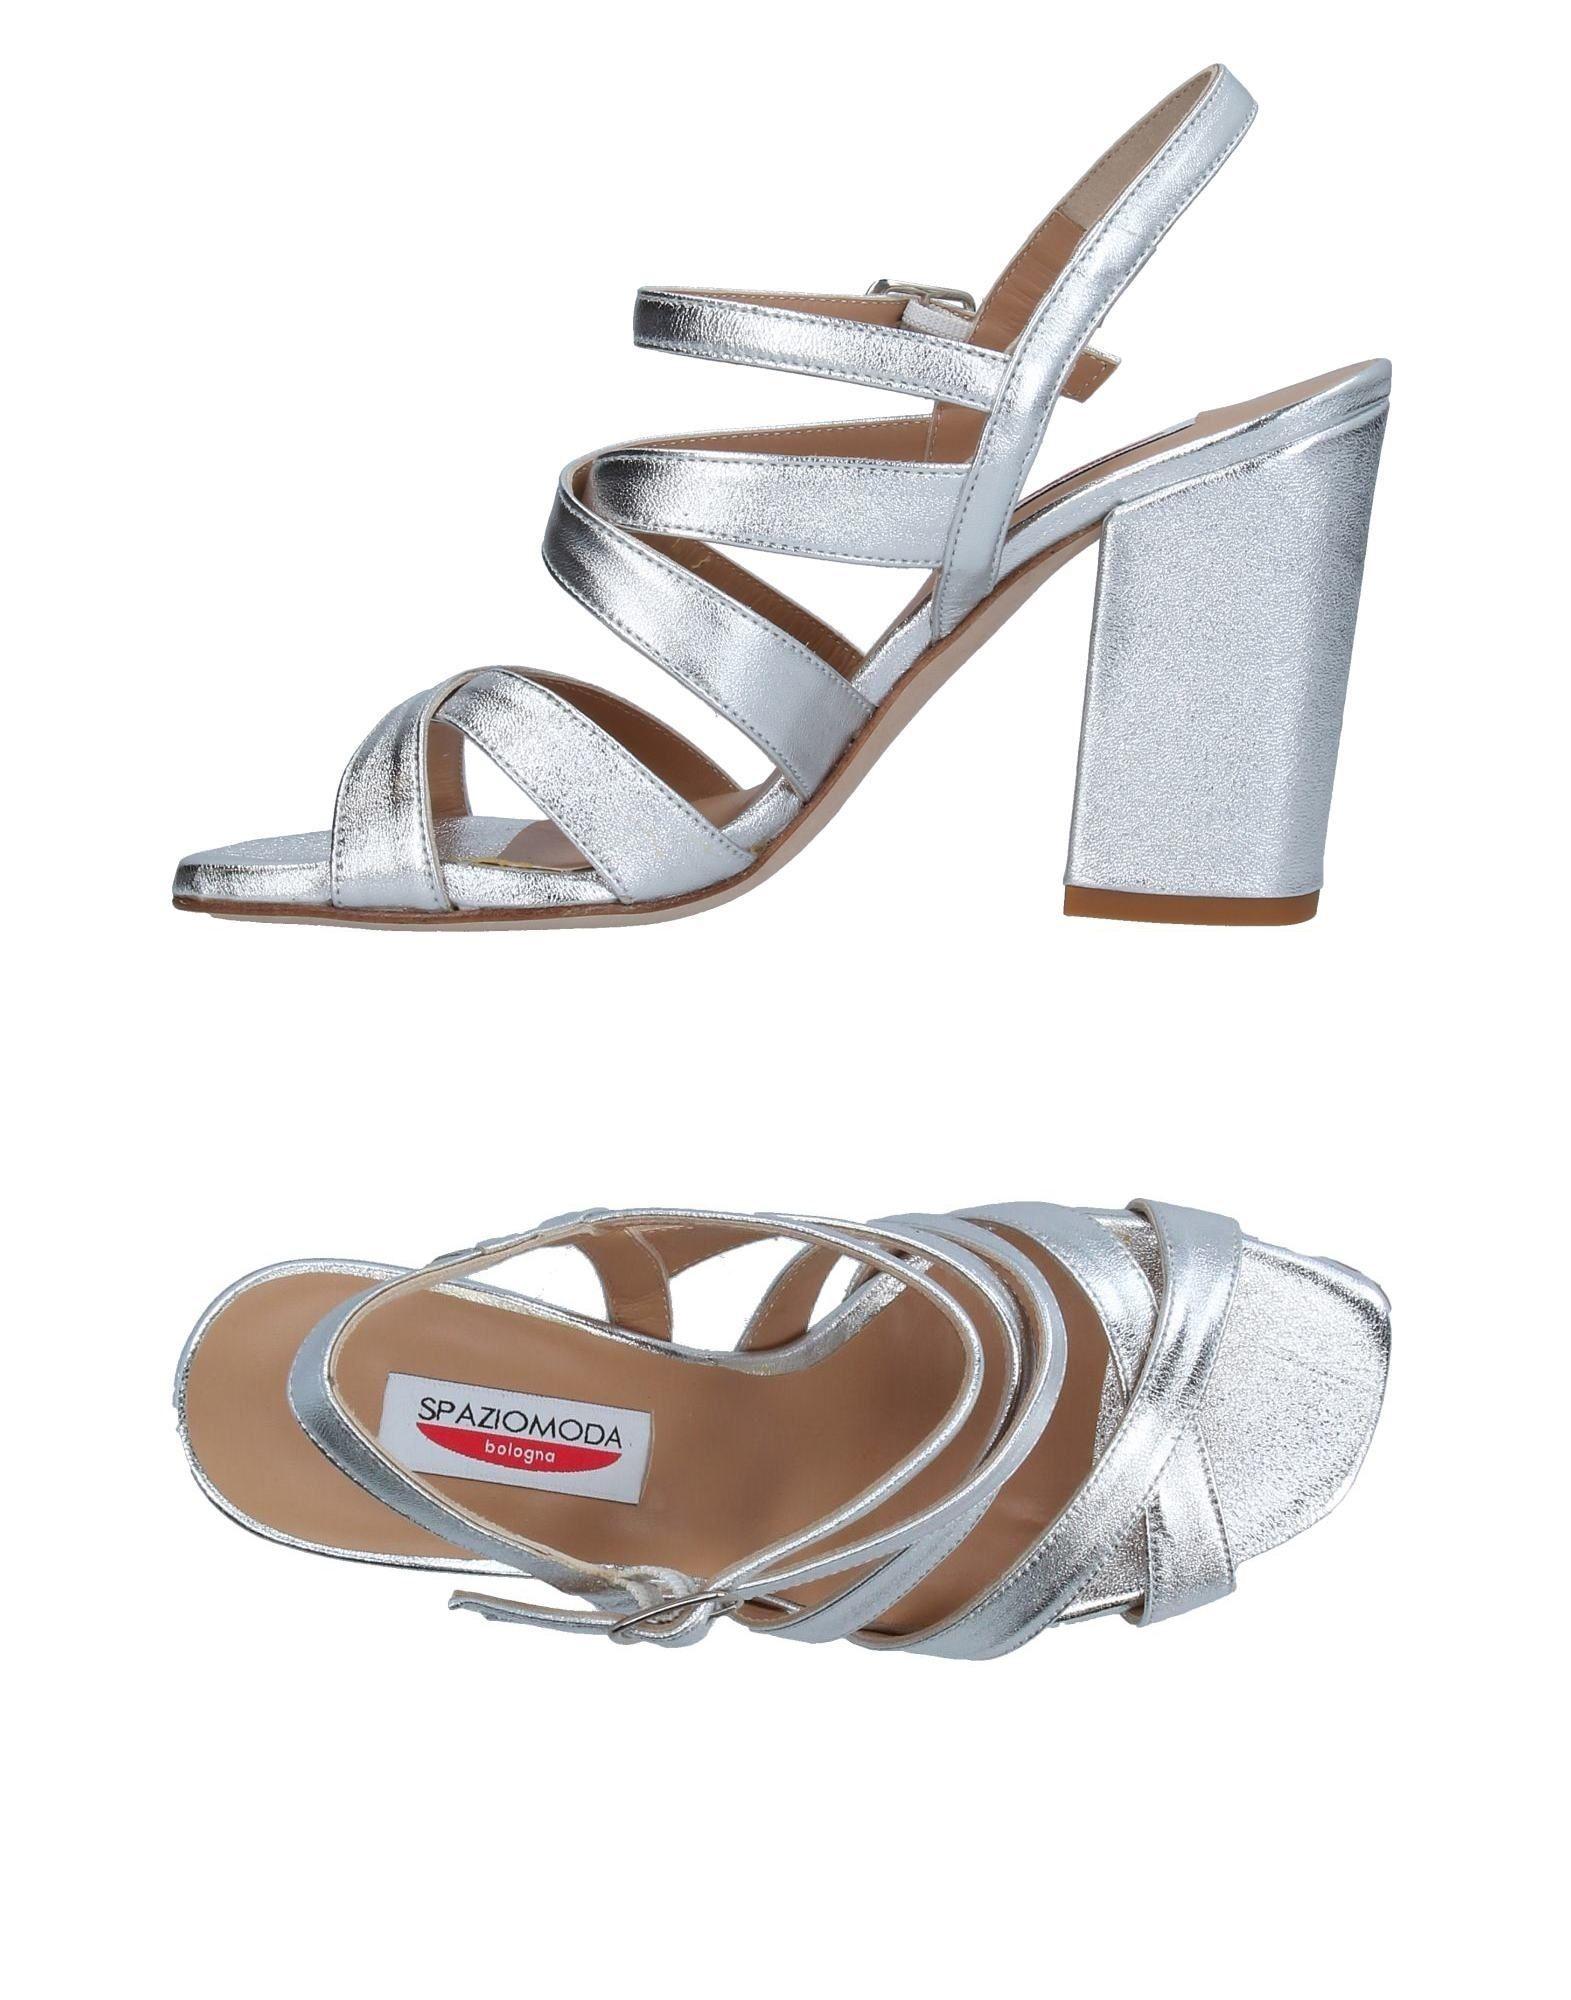 Sandales Spaziomoda Femme - Sandales Spaziomoda sur